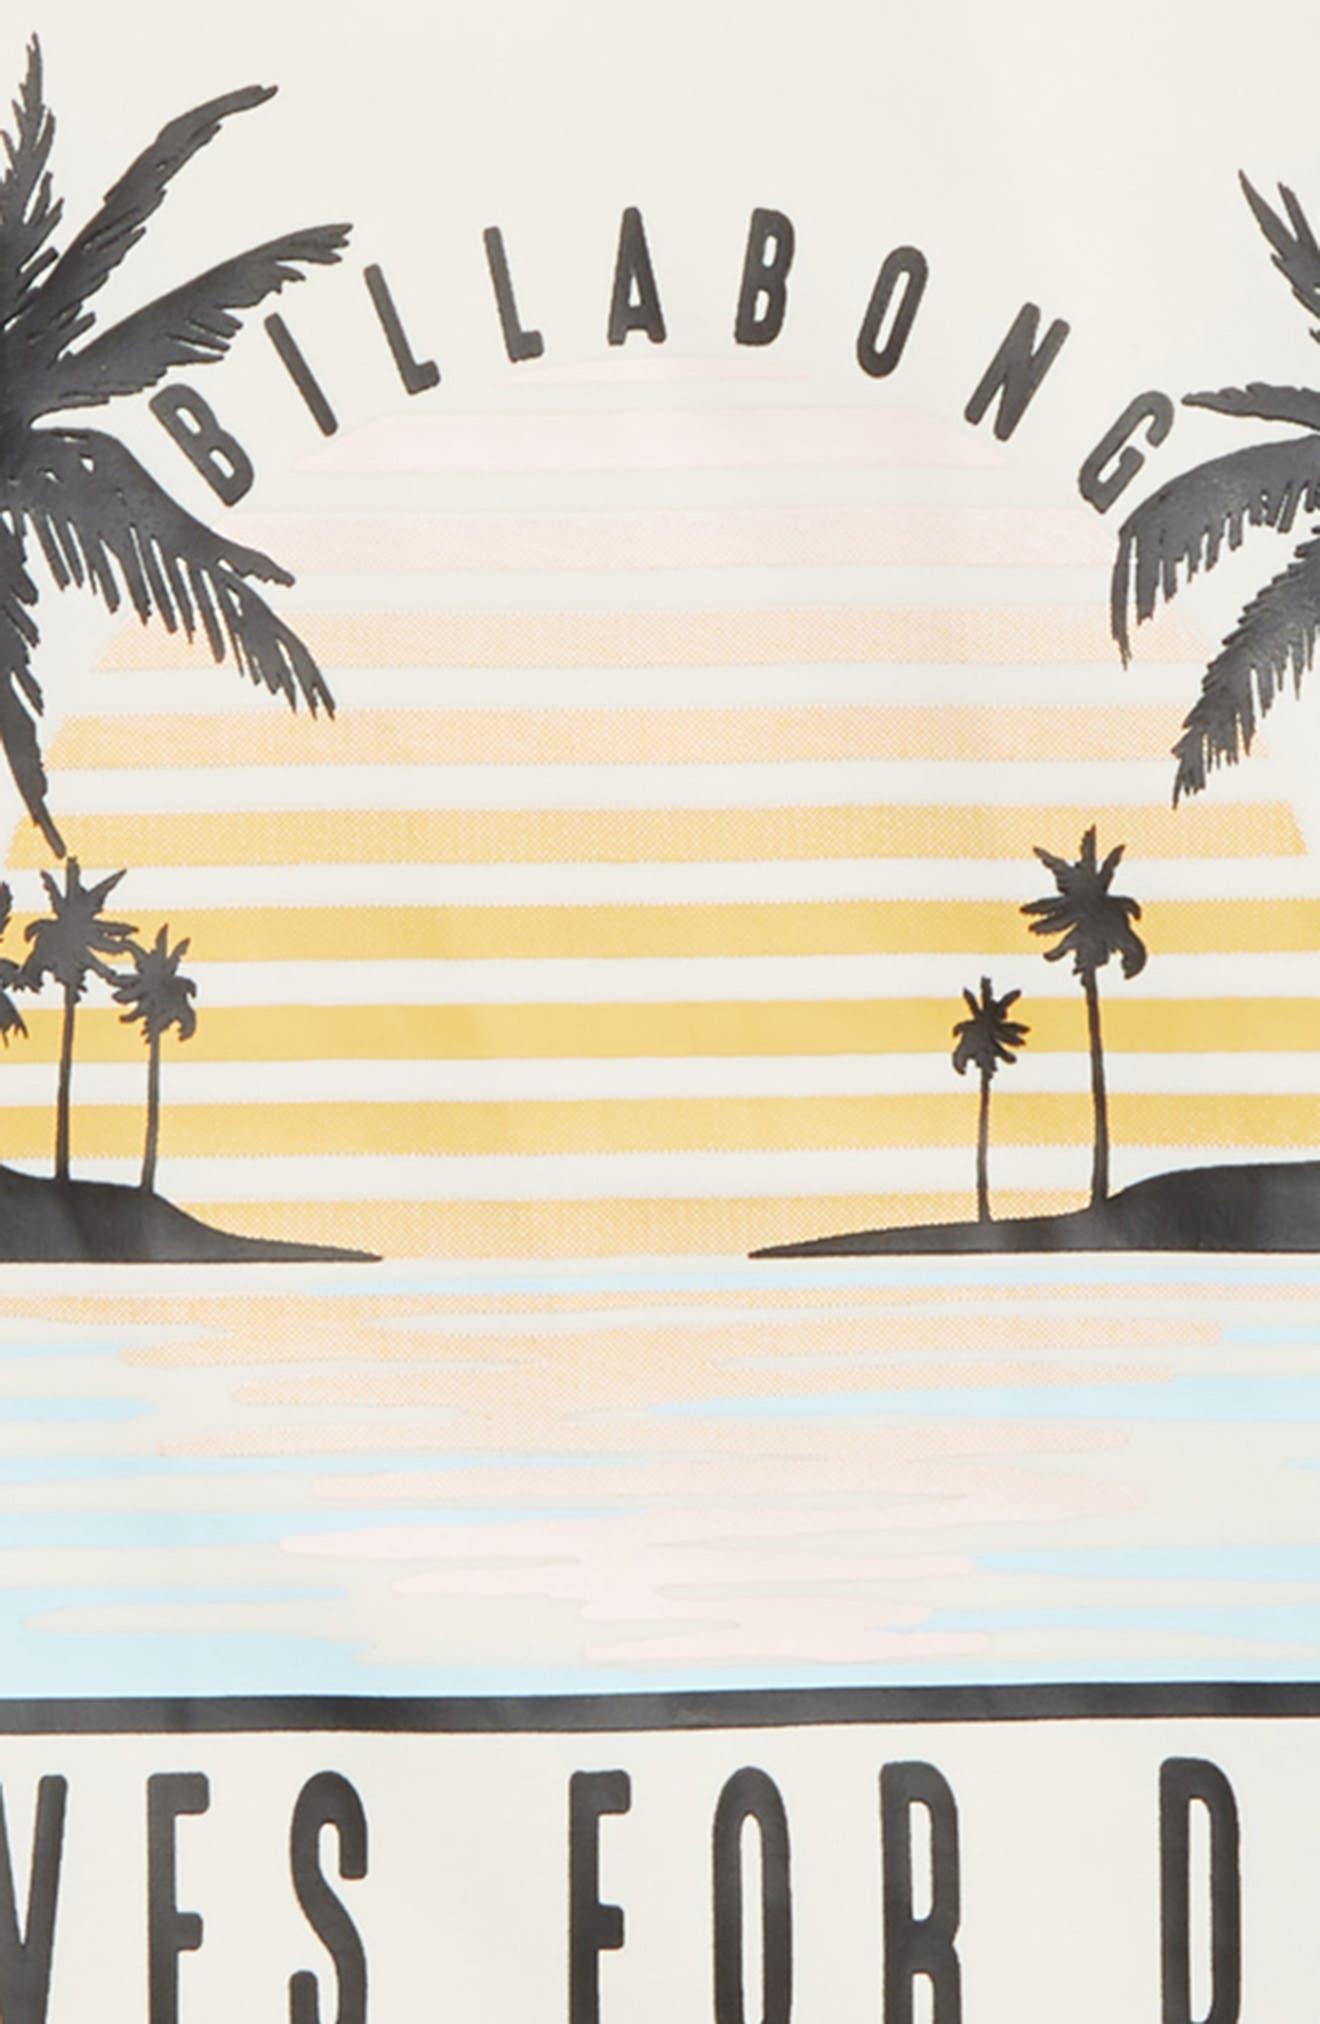 Waves for Days Long Sleeve Rashguard,                             Alternate thumbnail 2, color,                             012